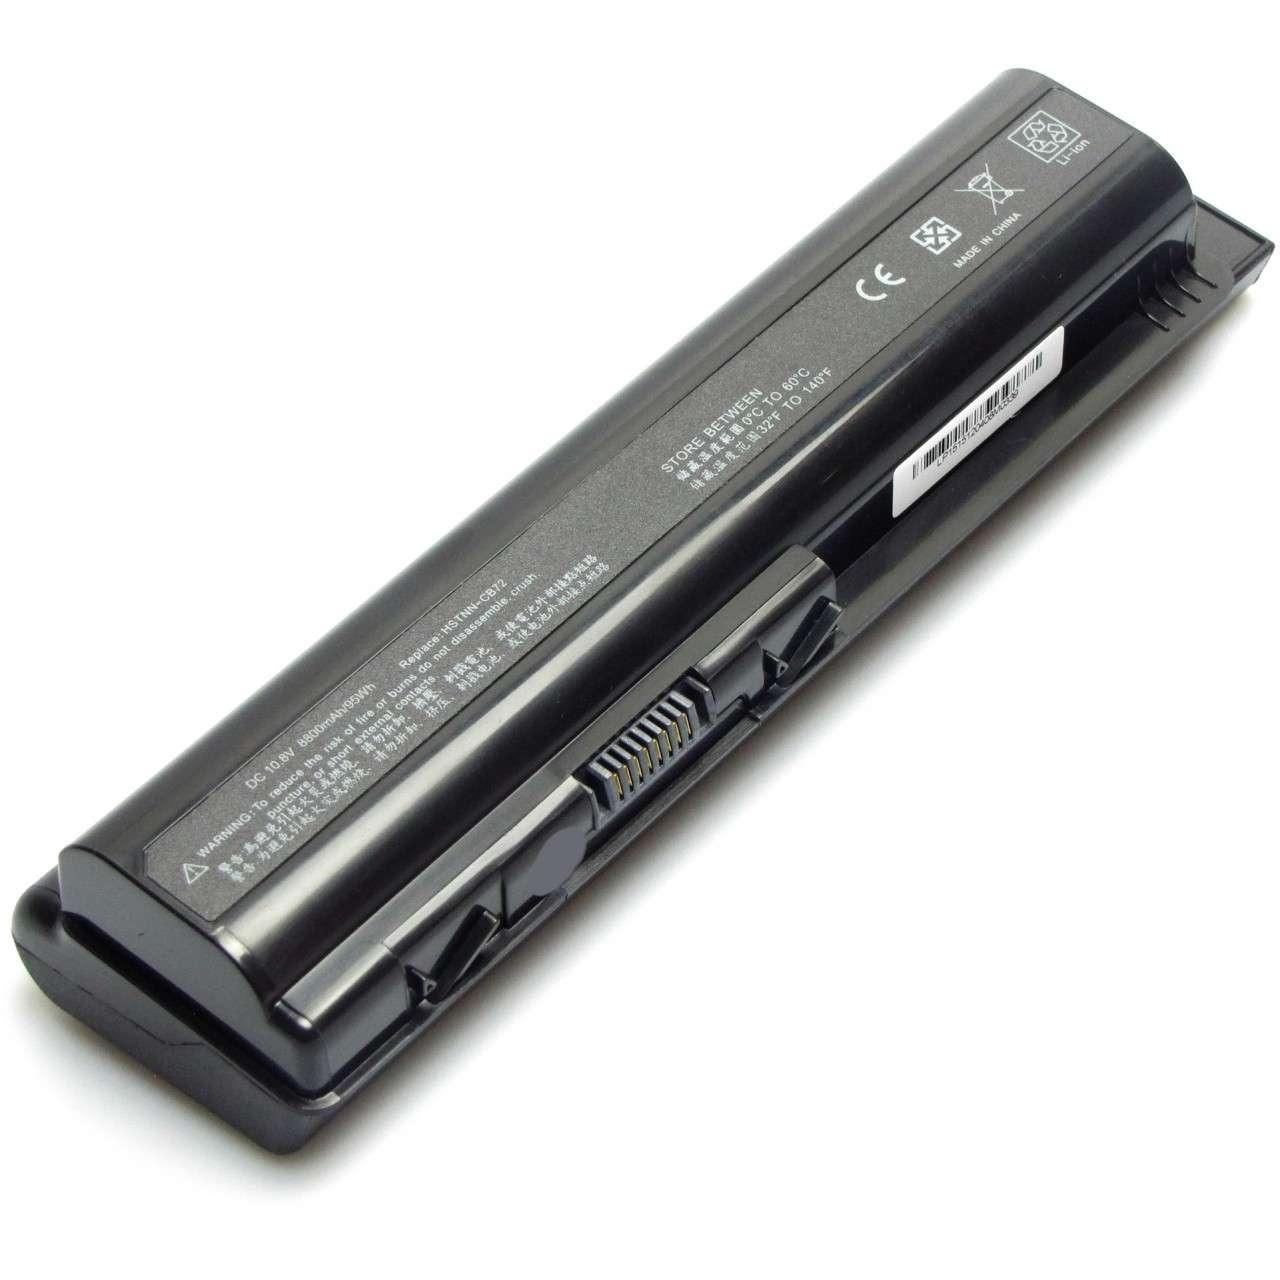 Baterie HP G71 333NR 12 celule imagine powerlaptop.ro 2021